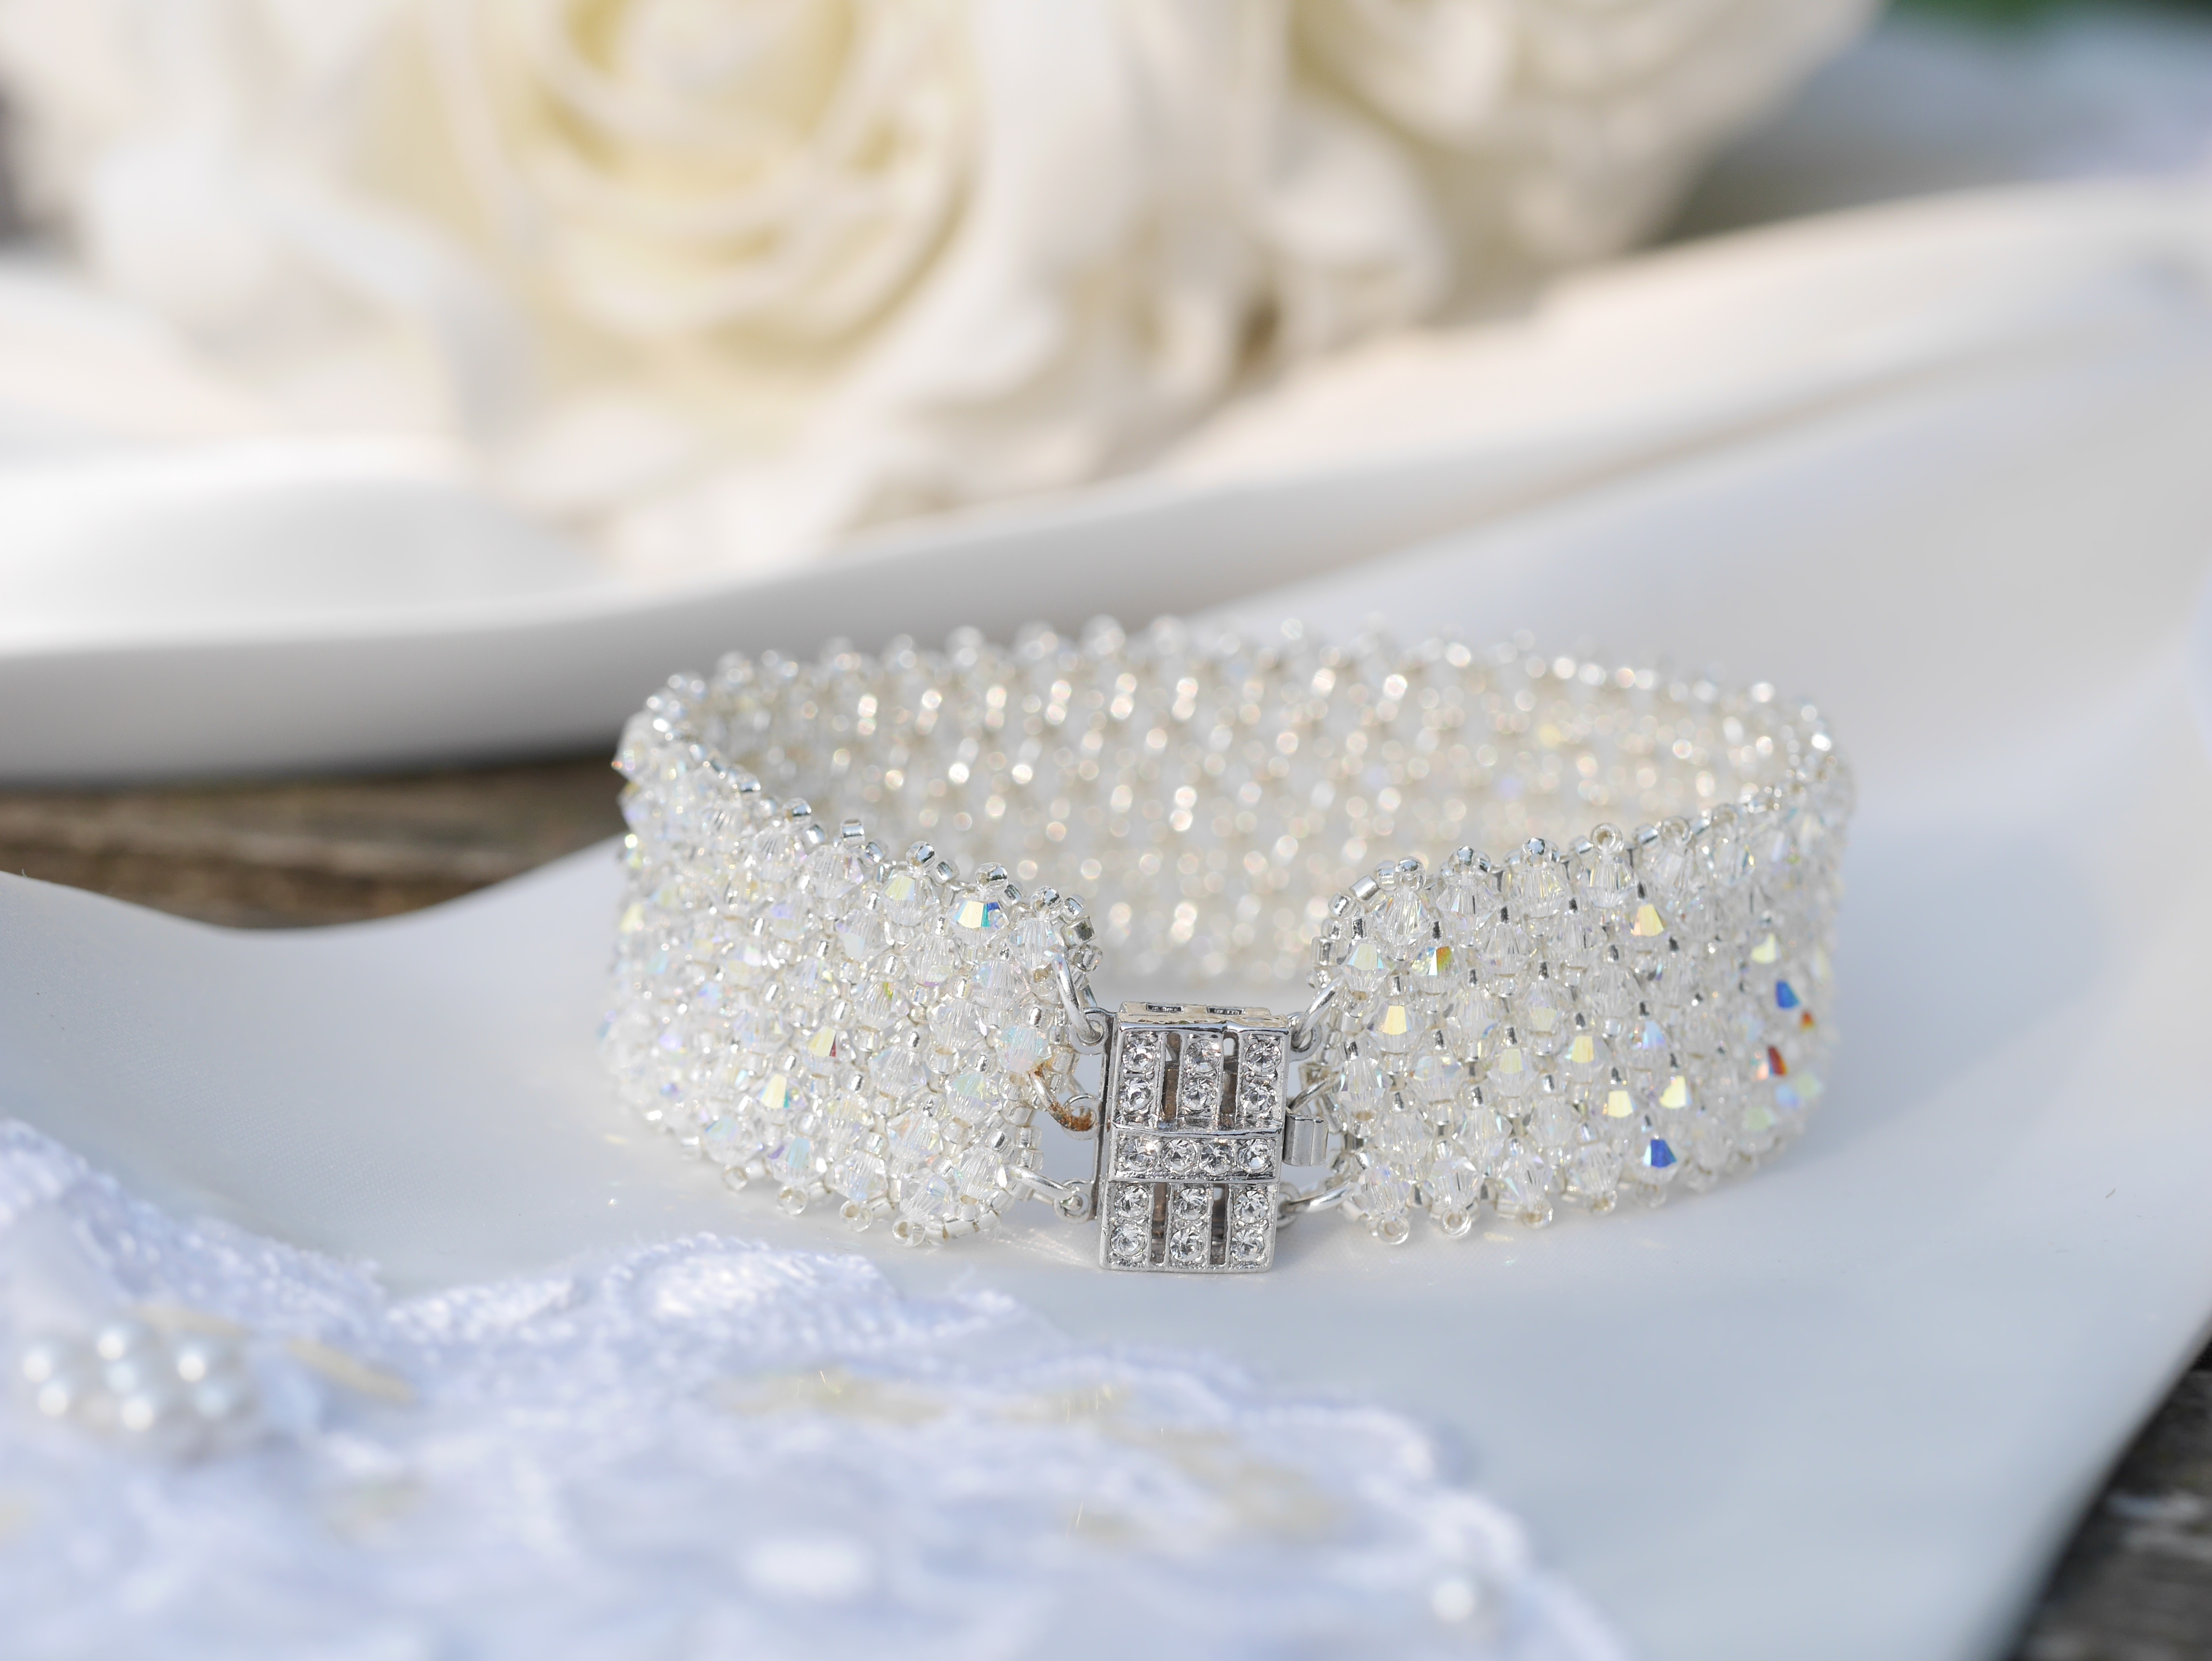 Crystal Encrusted Bracelet